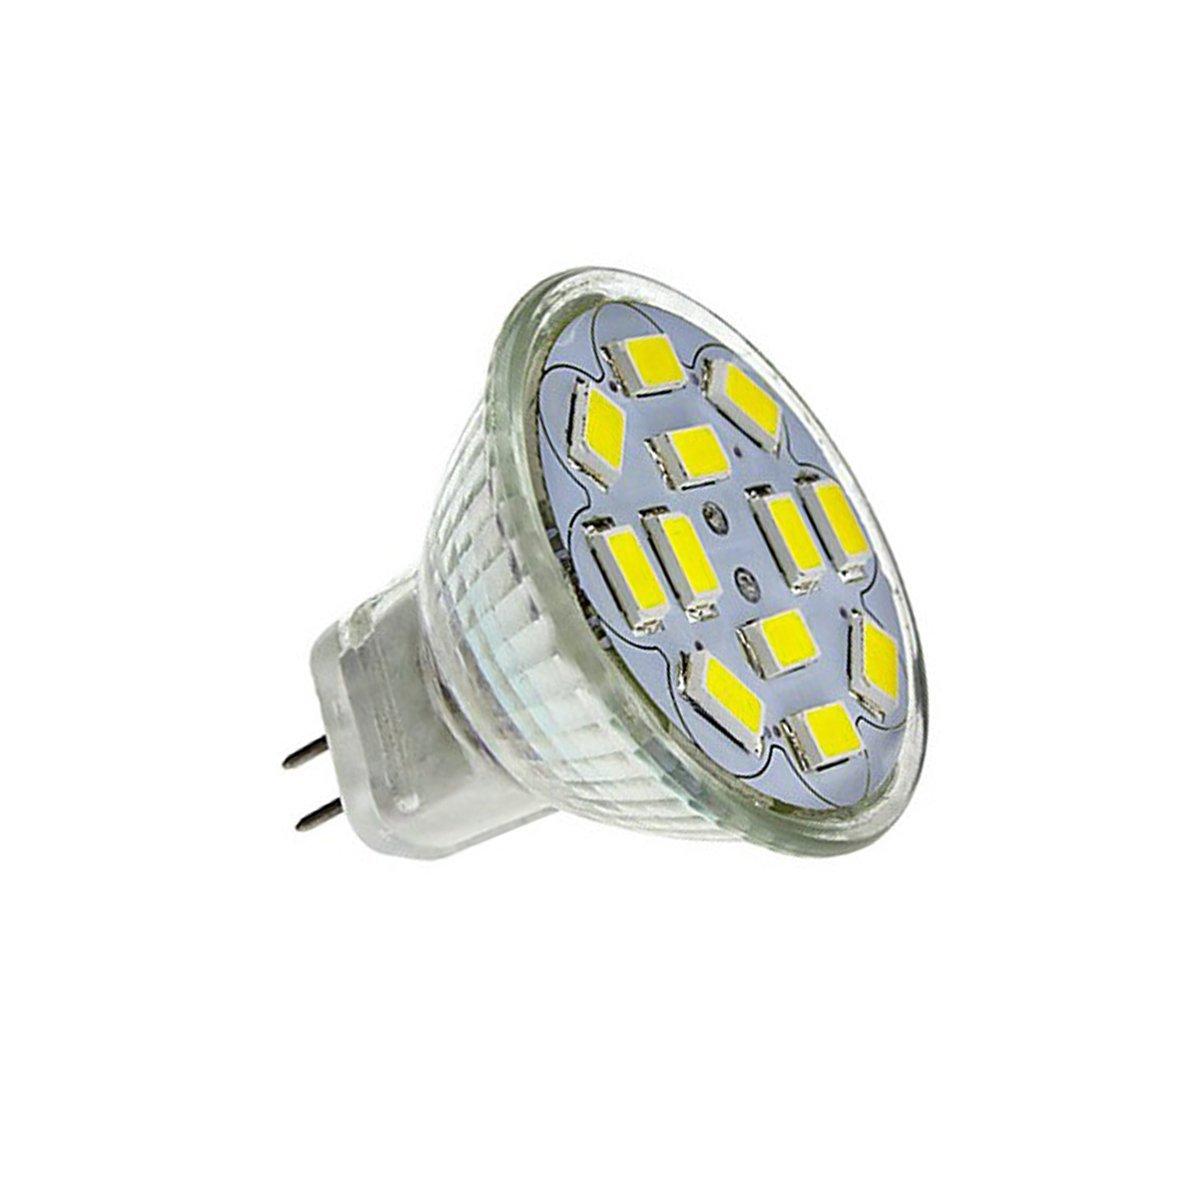 products motorbike smd car light scooter led classic festoon bulb mm volt lights